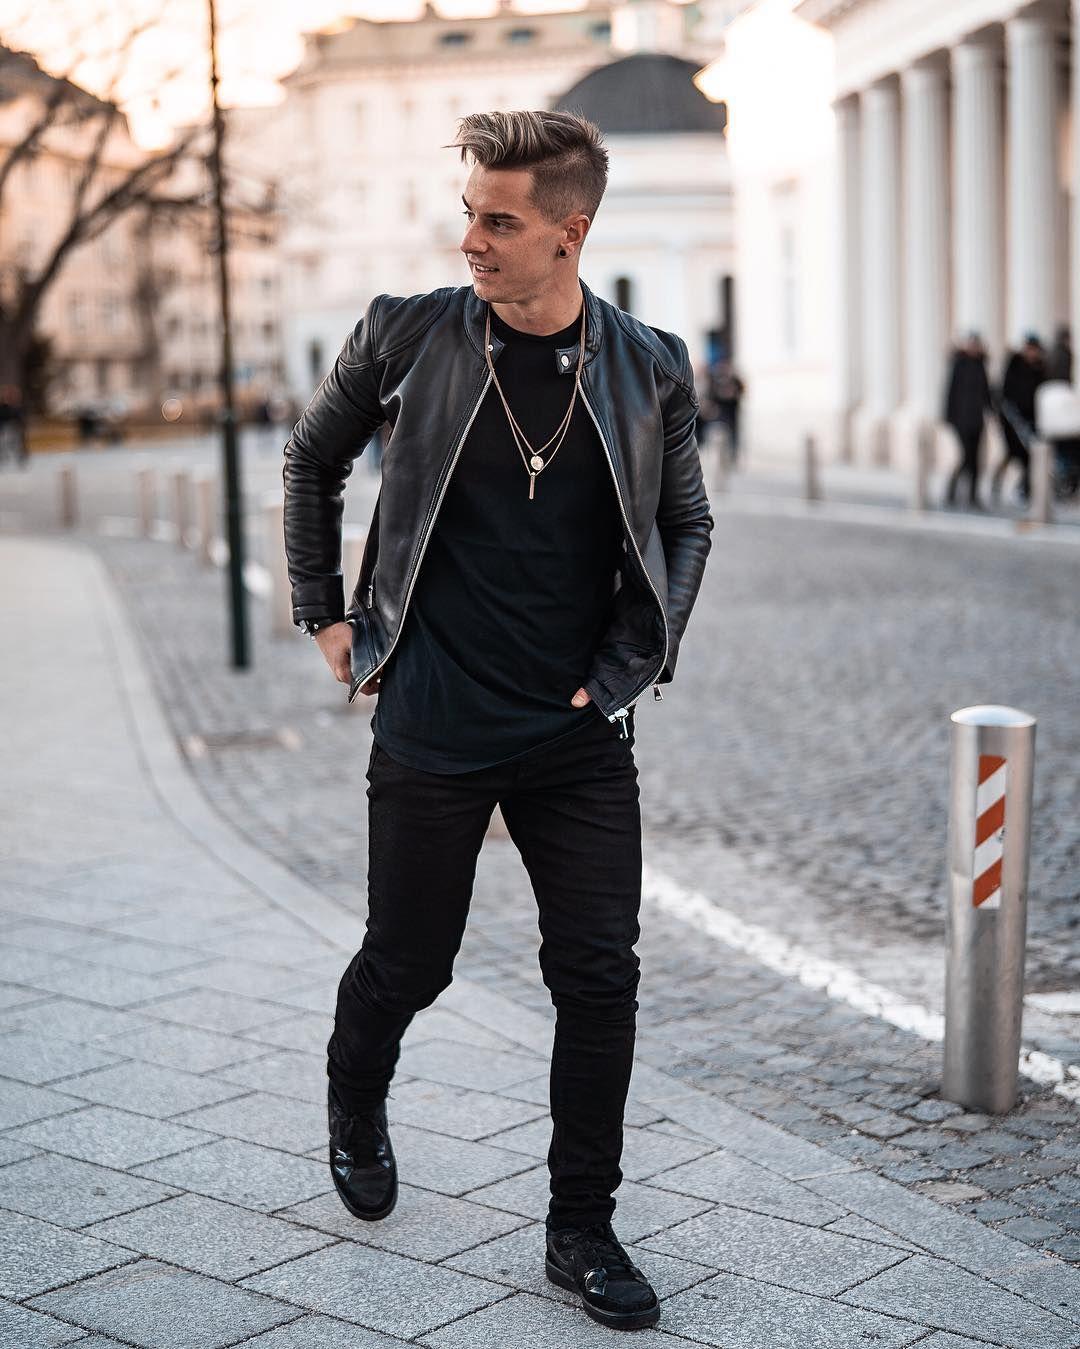 Schwarz In Schwarz Or Thursdays Allblack Ootd Streetstyles Menswears Black Outfit Men Leather Jacket Outfit Men Black Leather Jacket Outfit [ 1349 x 1080 Pixel ]